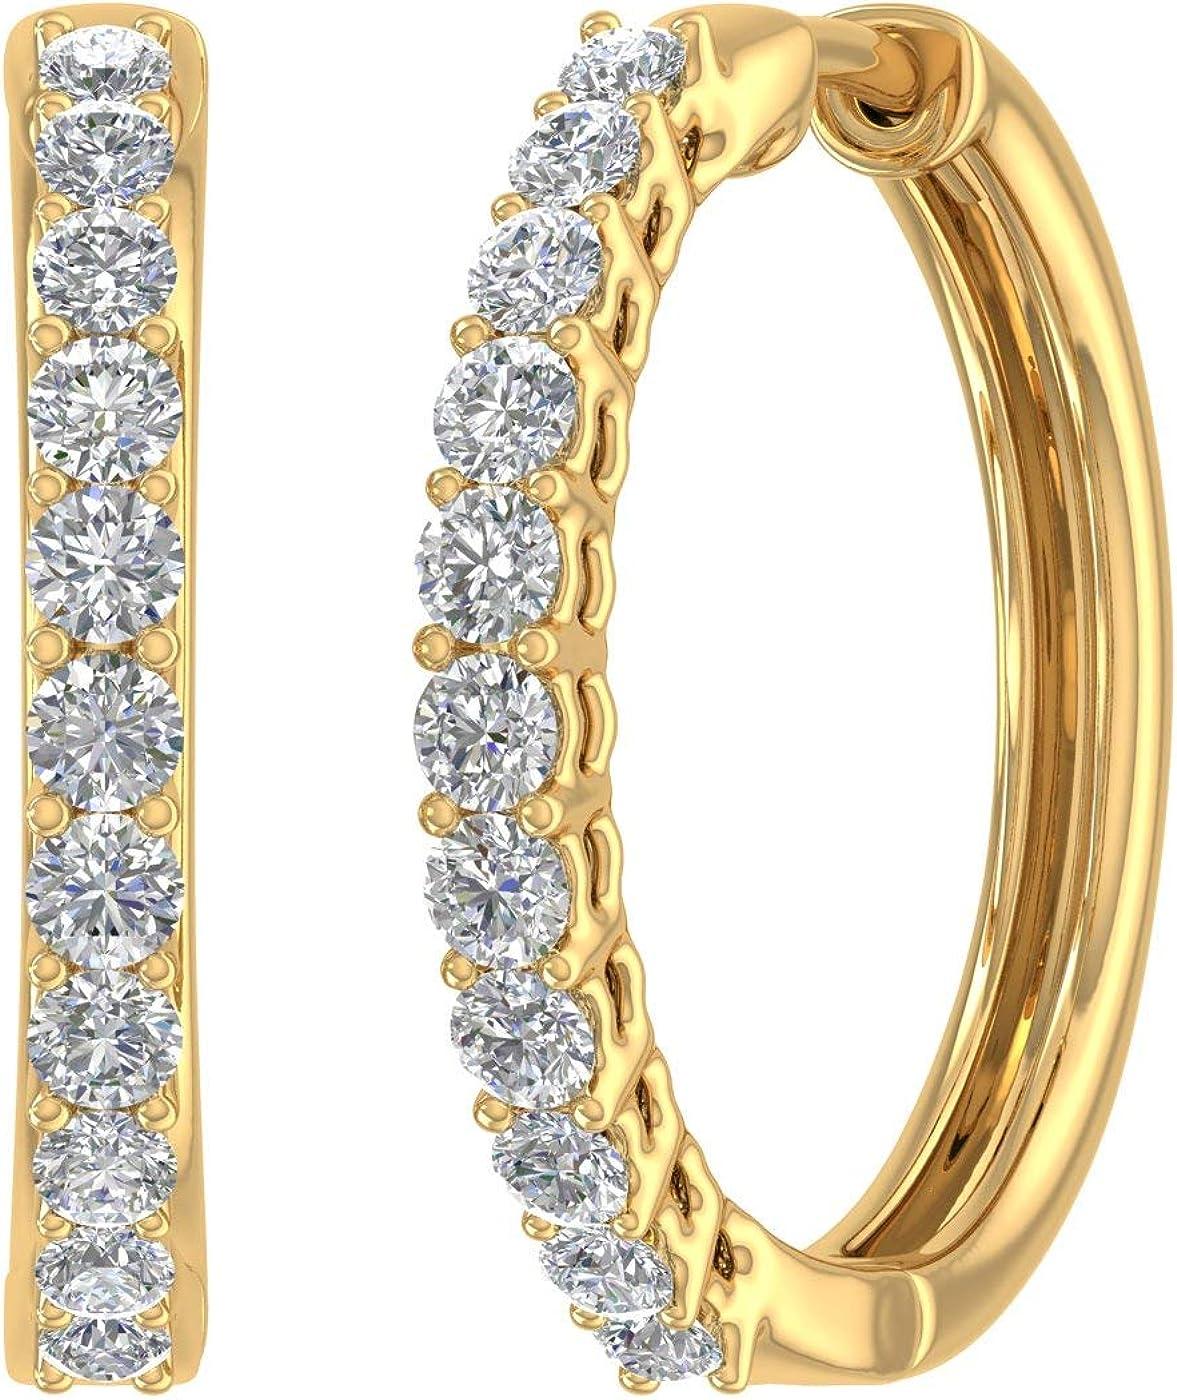 1 Carat Diamond Hoop Earrings wholesale in trend rank Certified IGI - 14K Gold